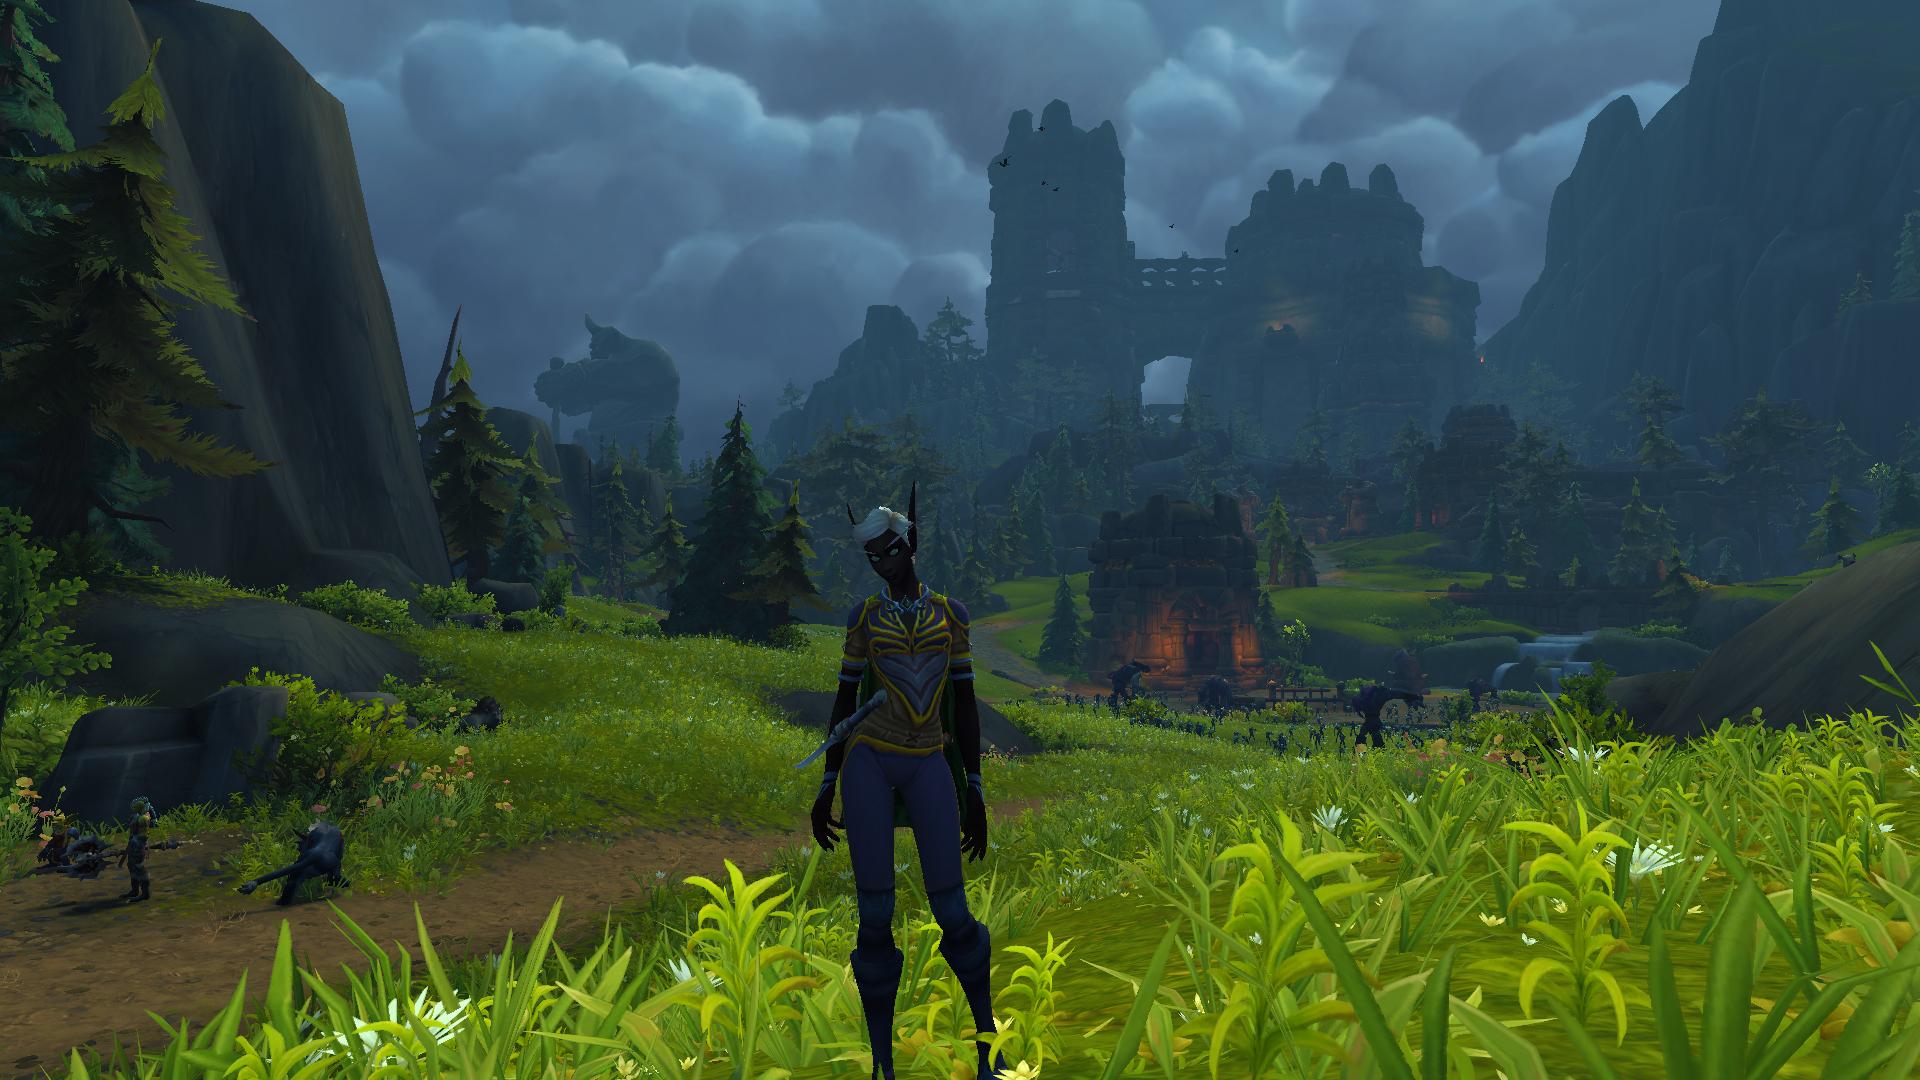 World of Warcraft: Shadowlands beta impressions | Laptop Mag